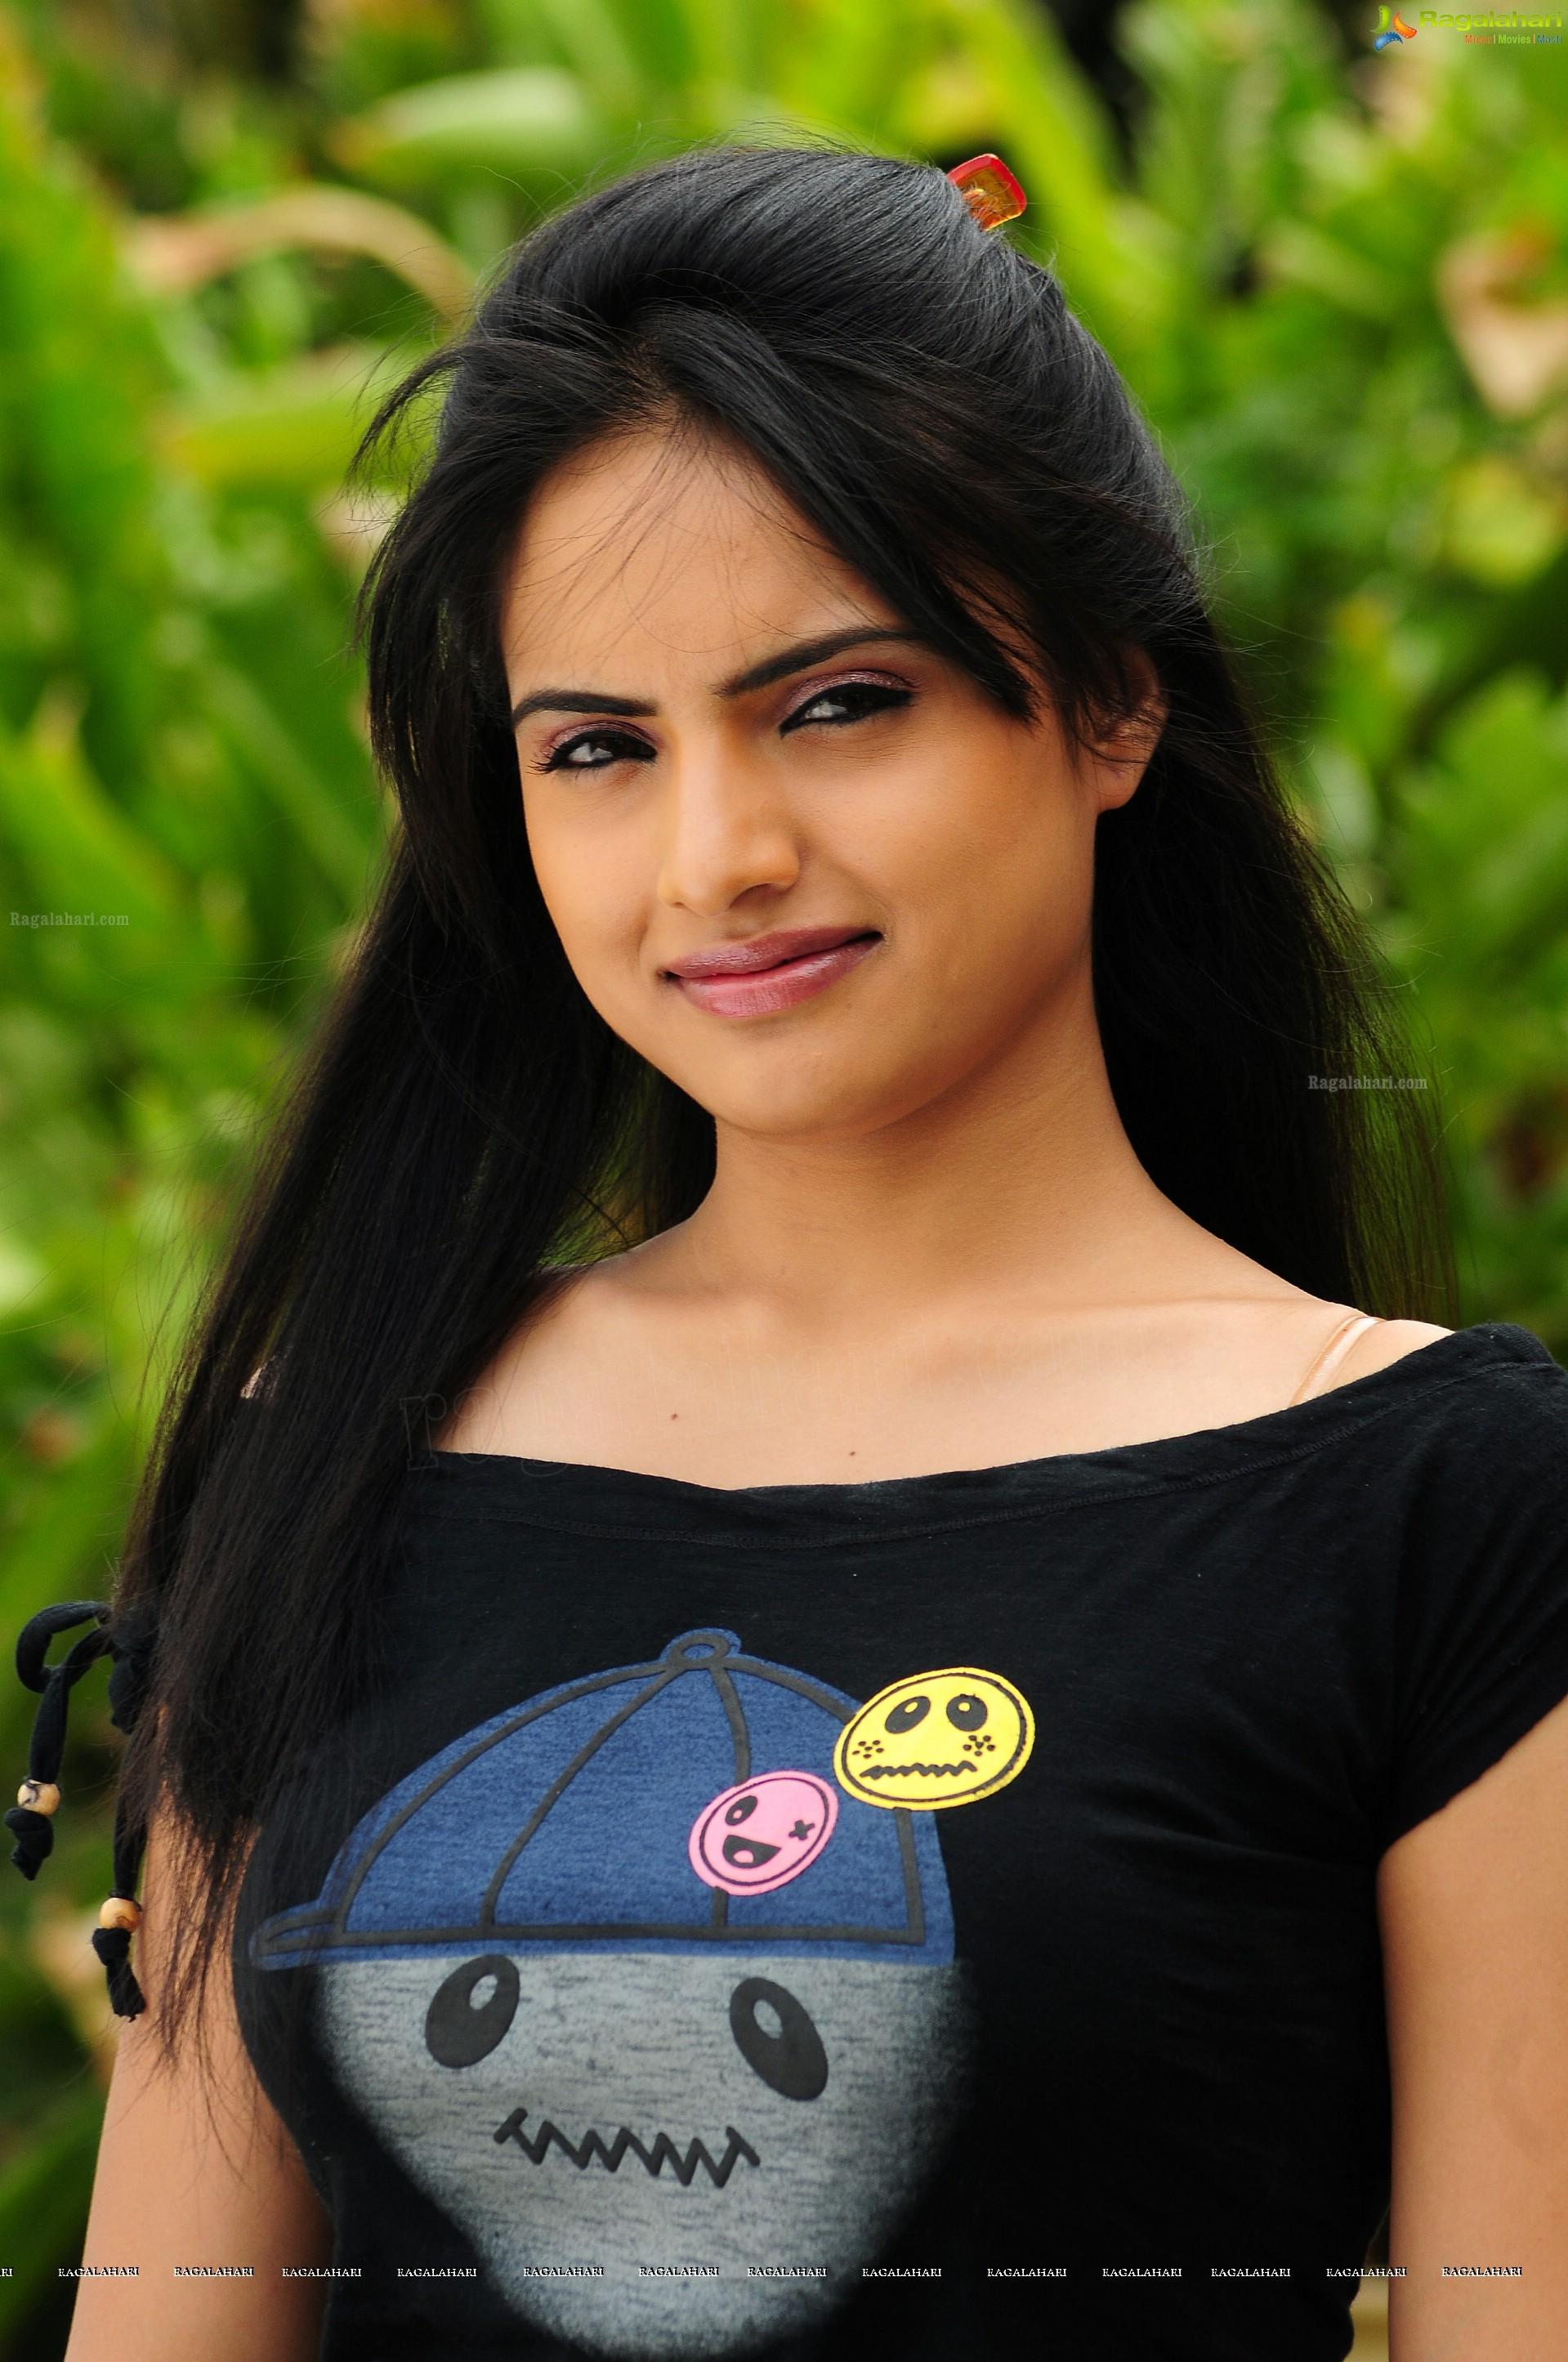 reetu kaur (hd) image 8 | telugu heroines photos,telugu actress